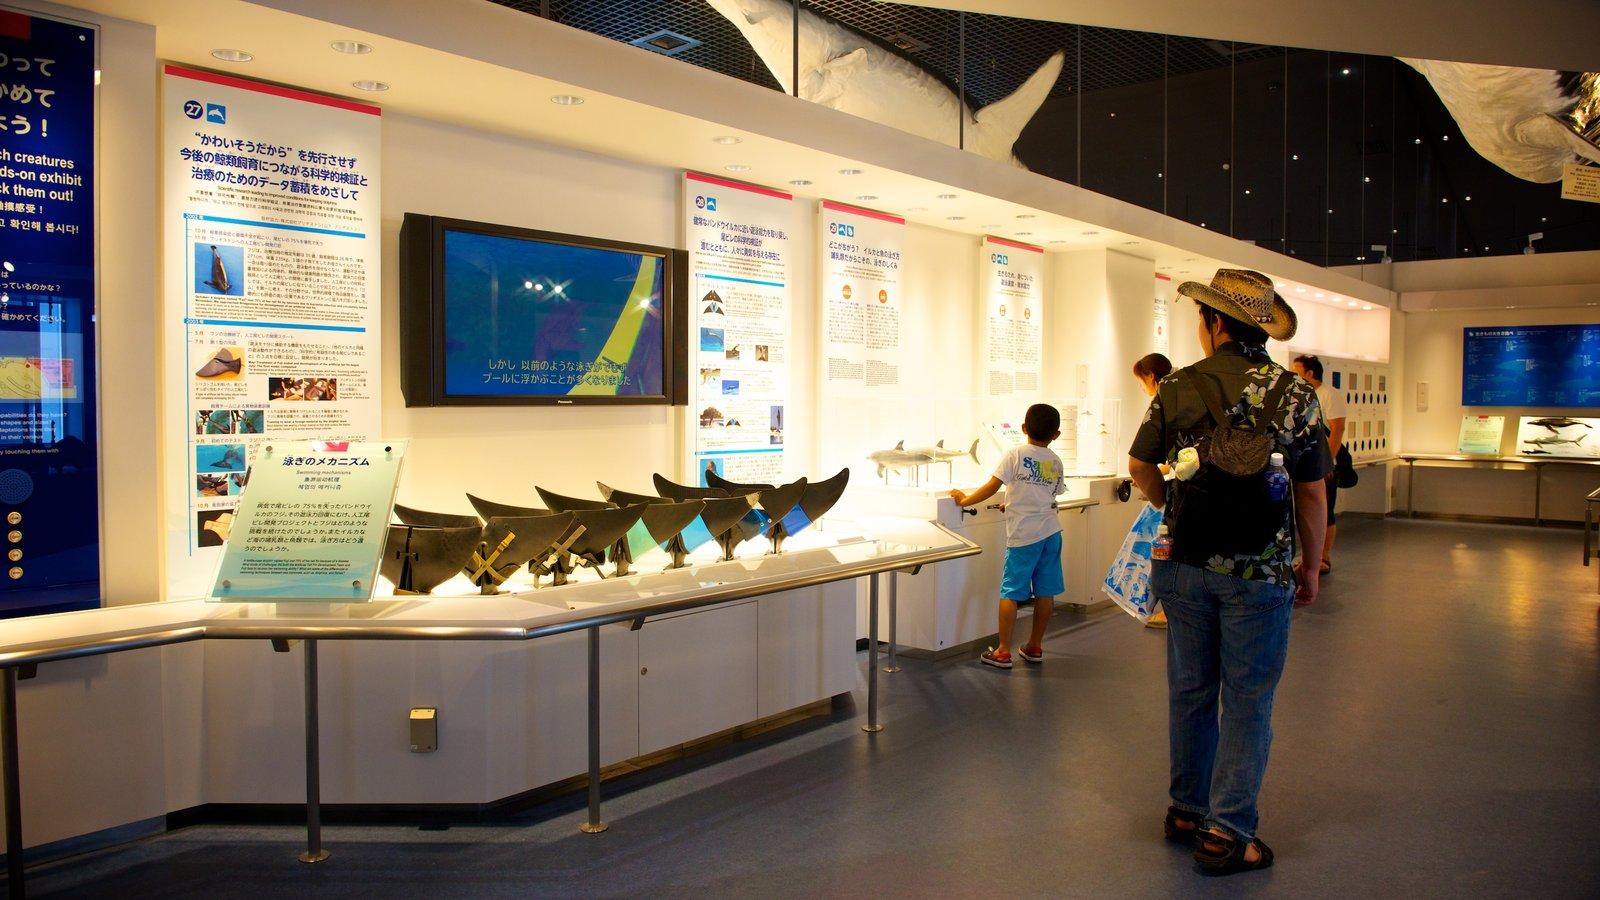 Okinawa Churaumi Aquarium featuring interior views and marine life